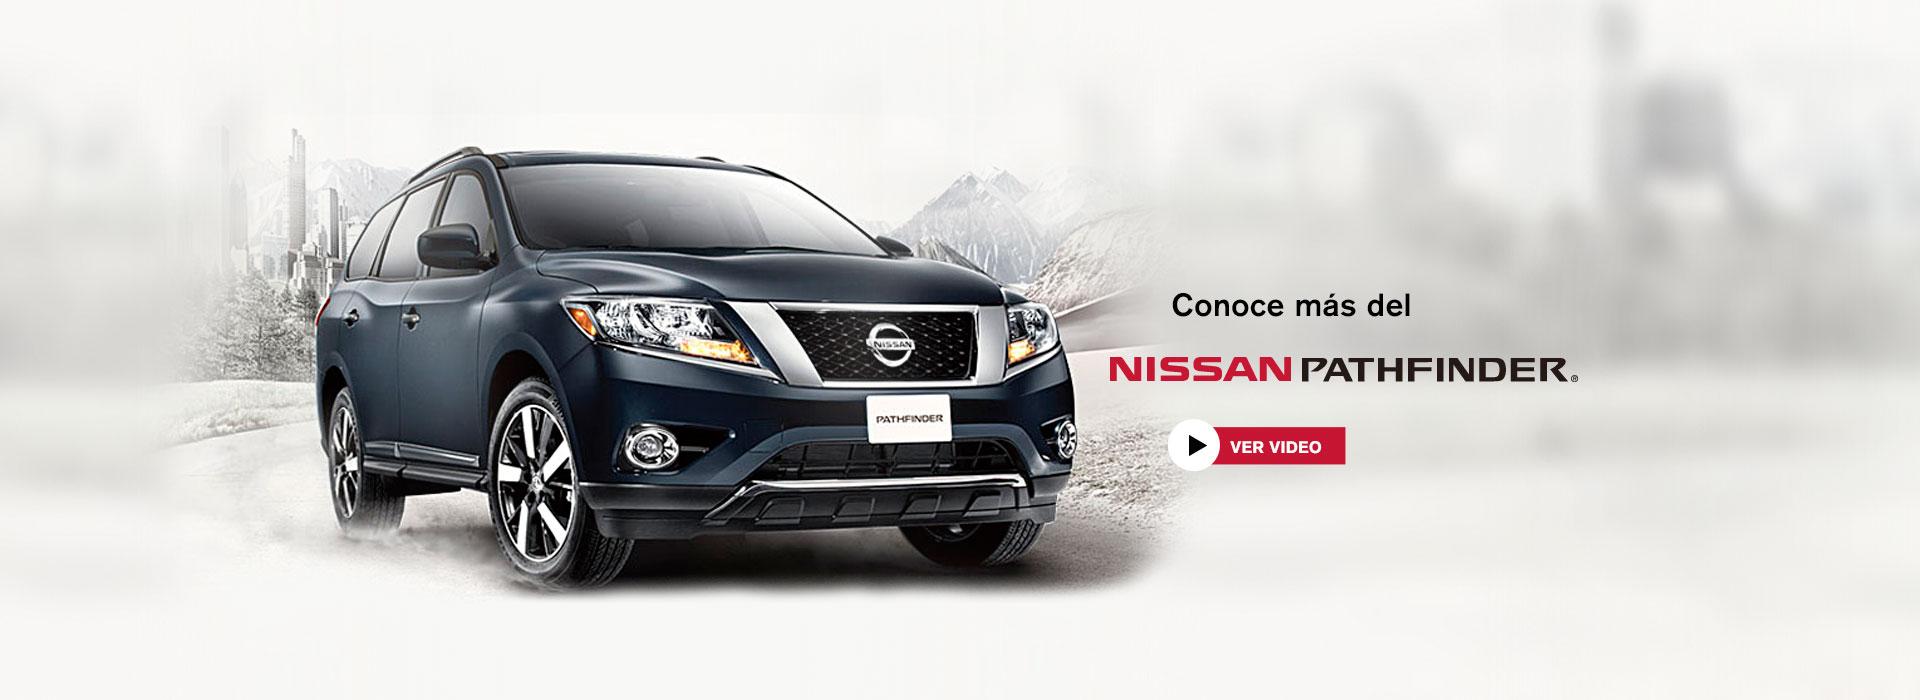 Conoce Nissan Pathfinder